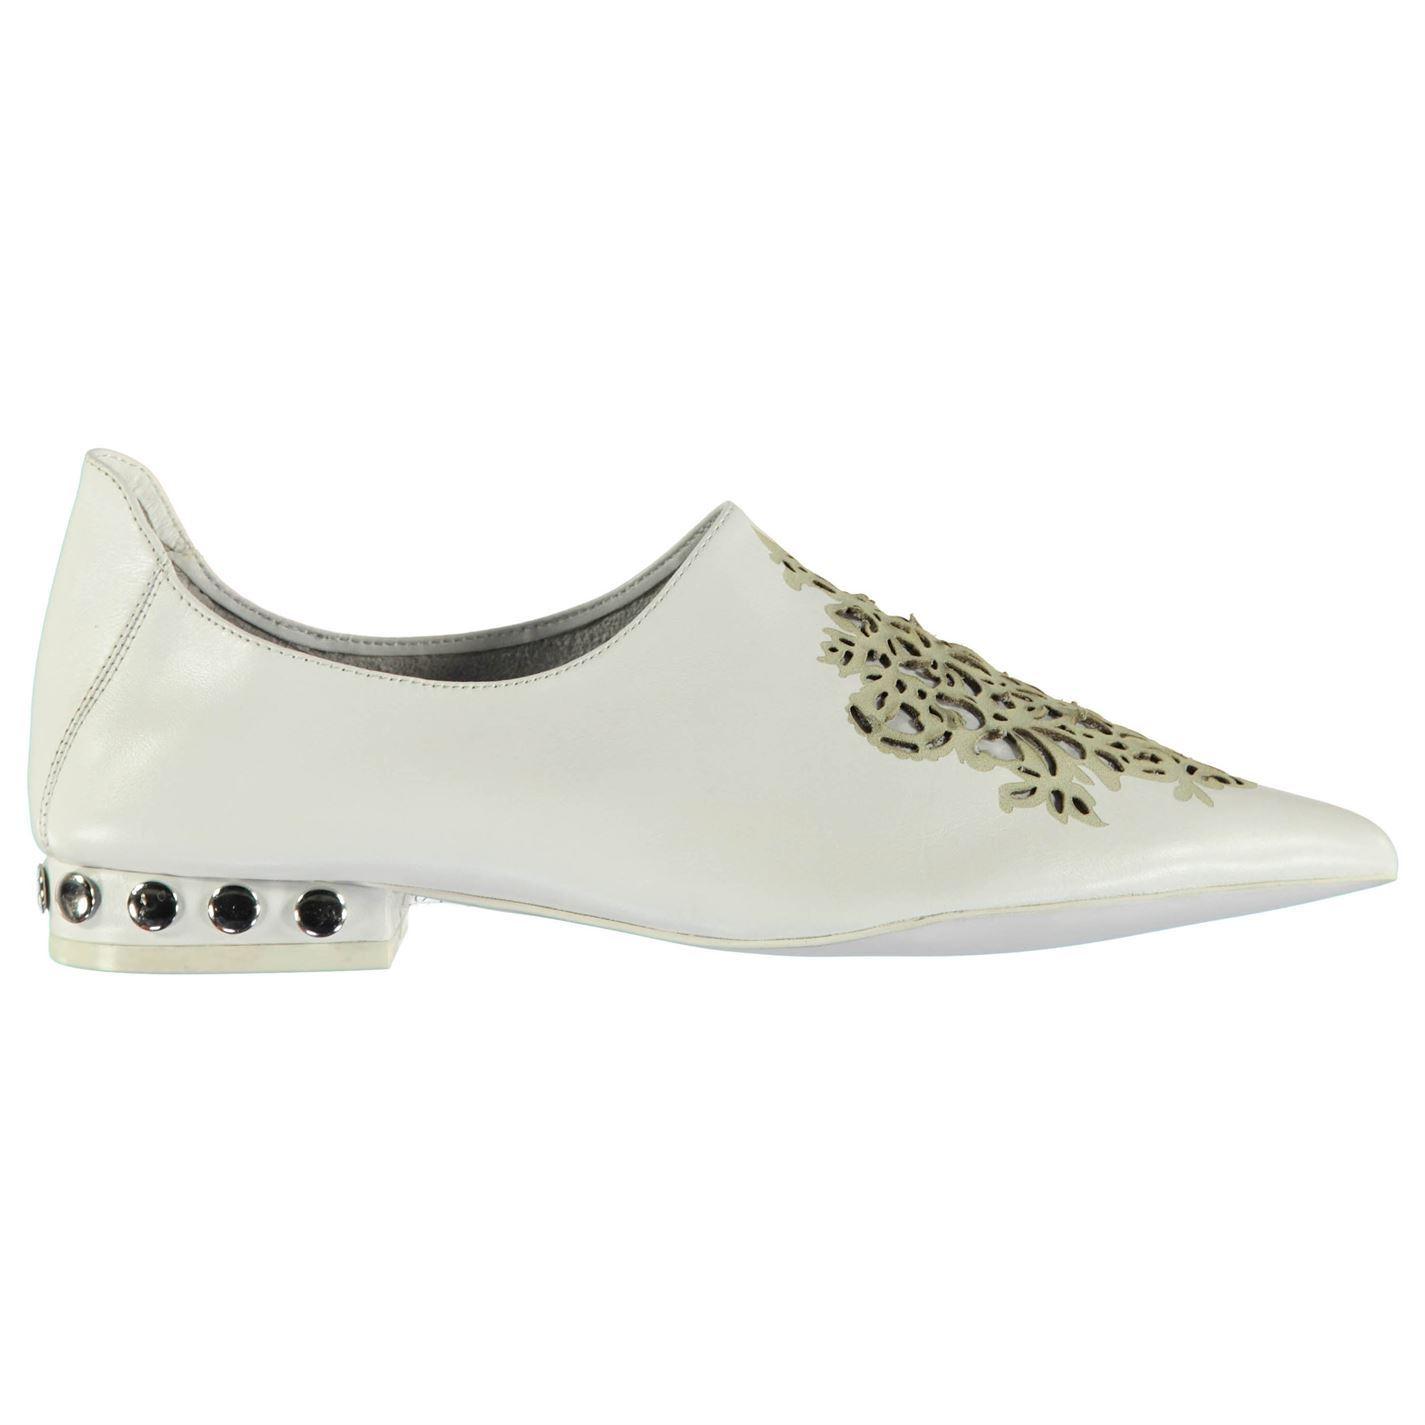 Jeffrey Campbell Damenschuhe Cersei Stud Schuhes Slip On Pointed Toe Slight Heel